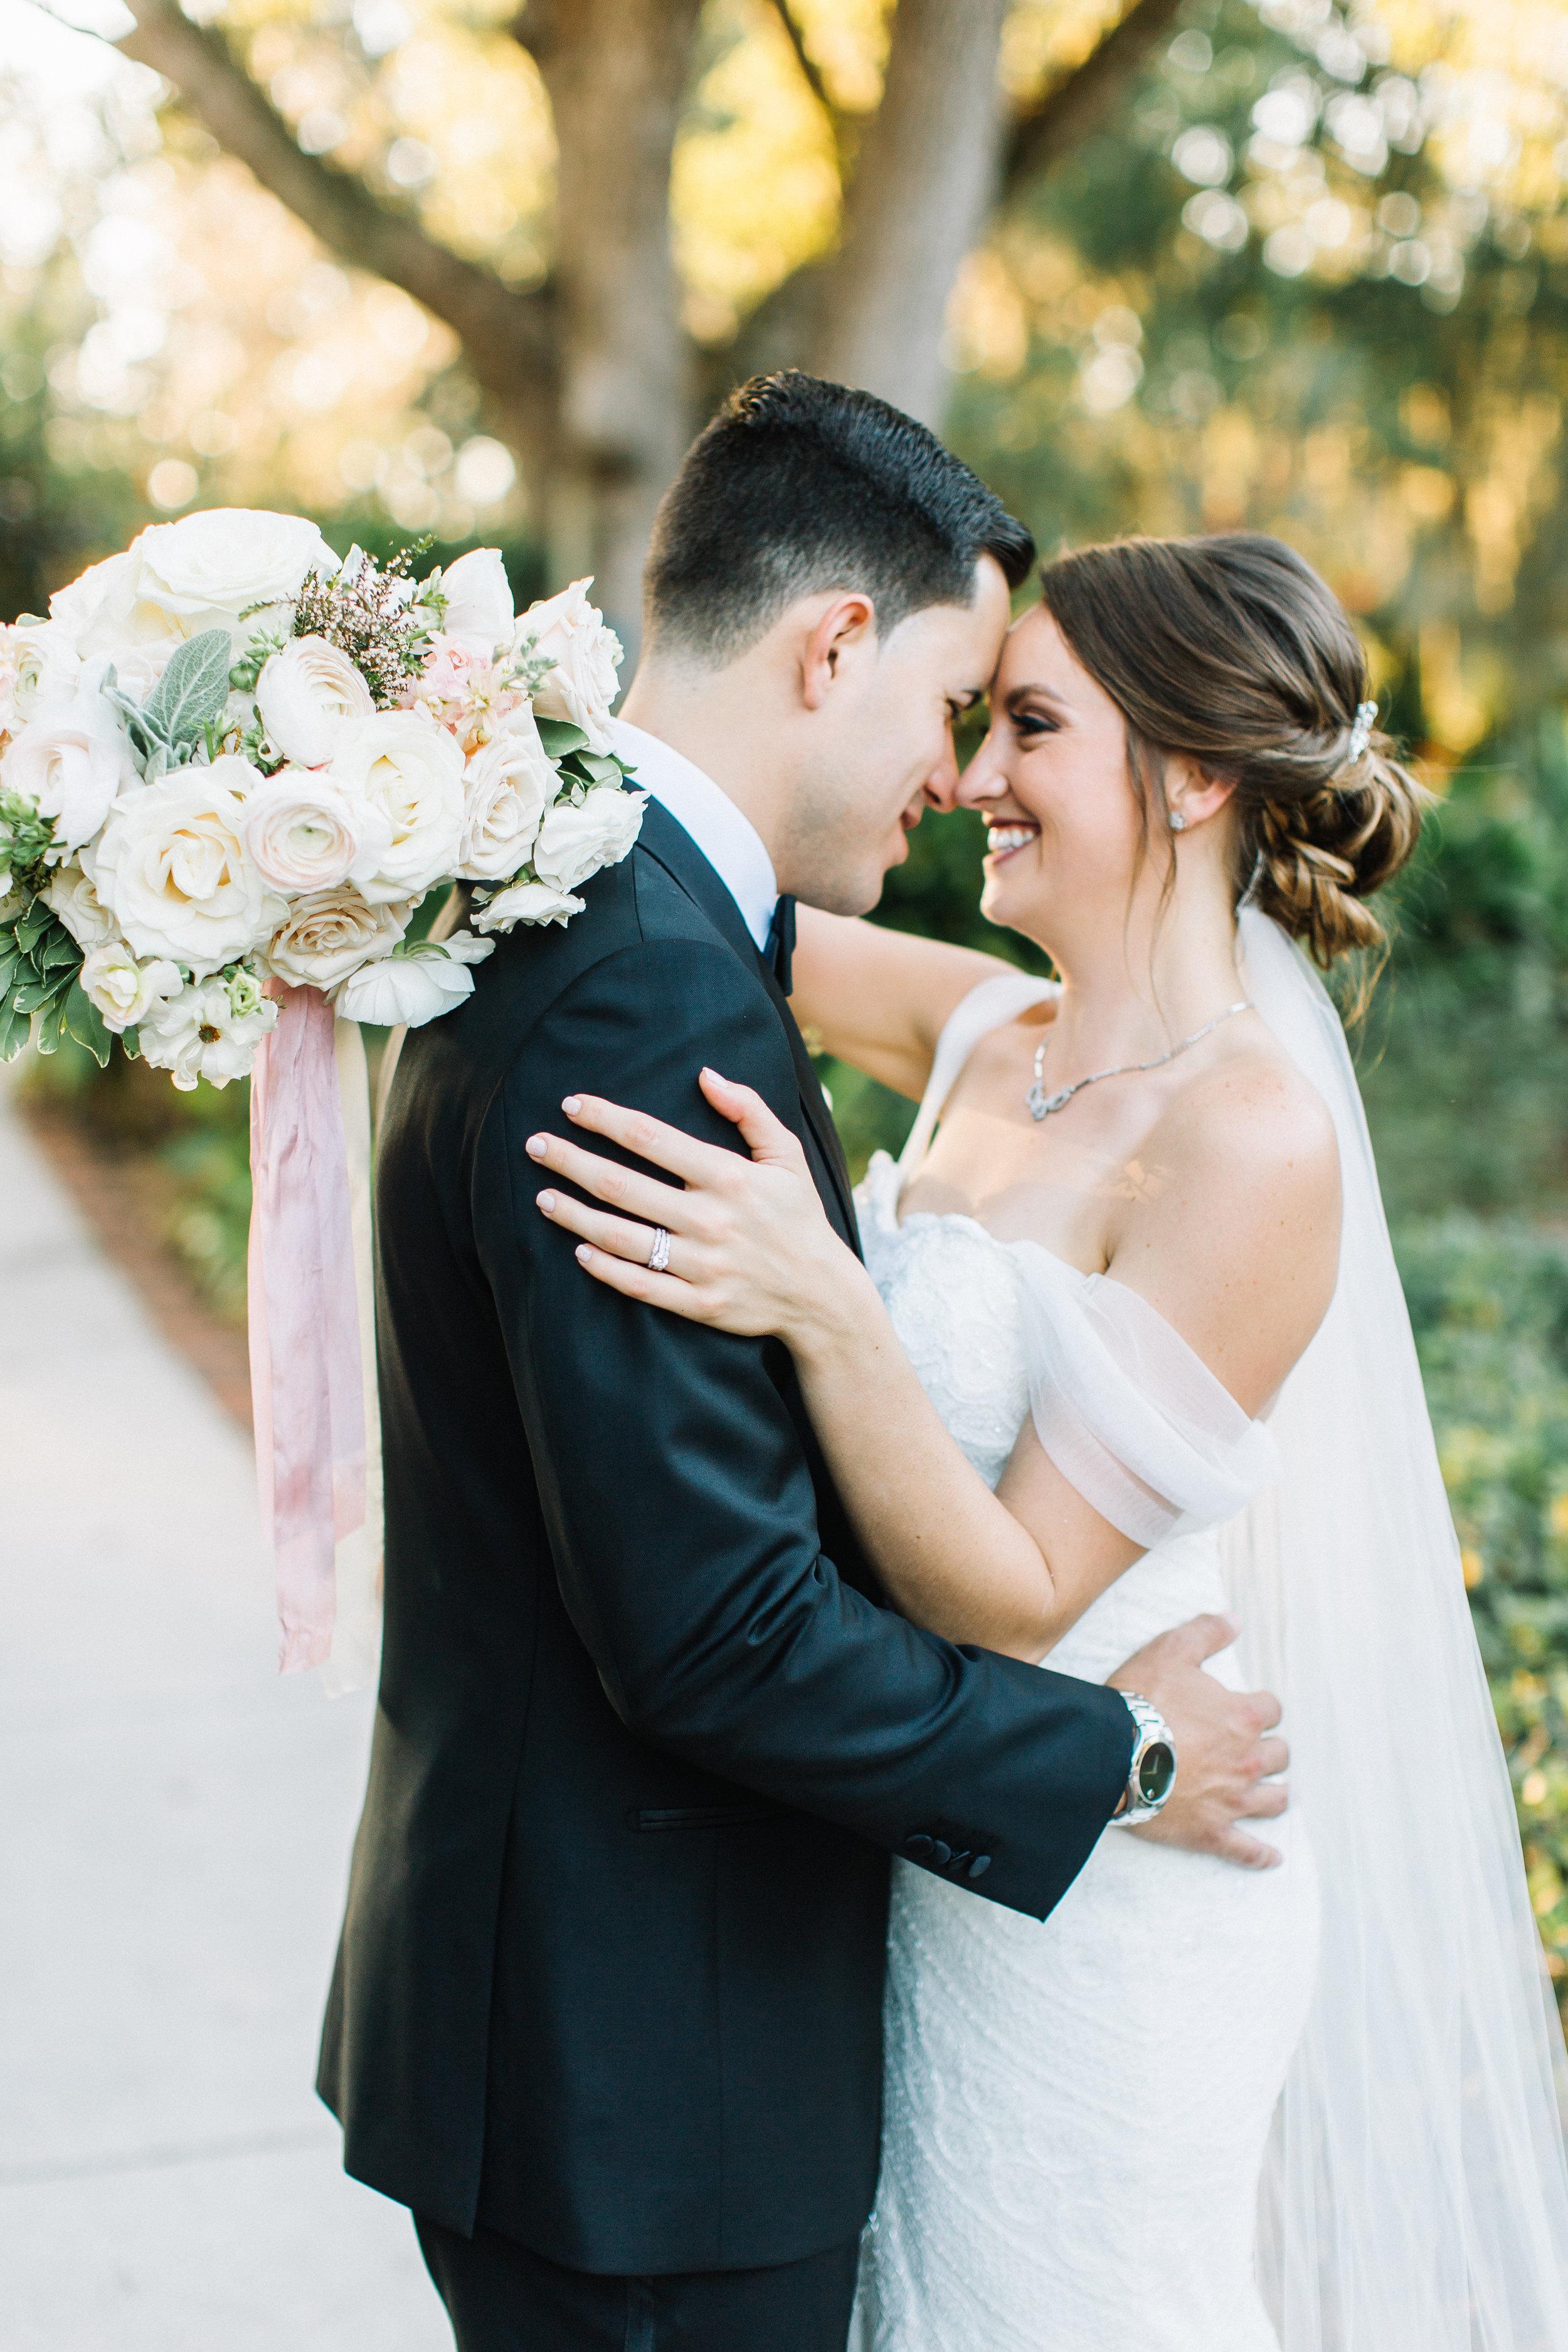 Mike_Alexis_Cypress_Grove_Estate_Wedding-438.jpg